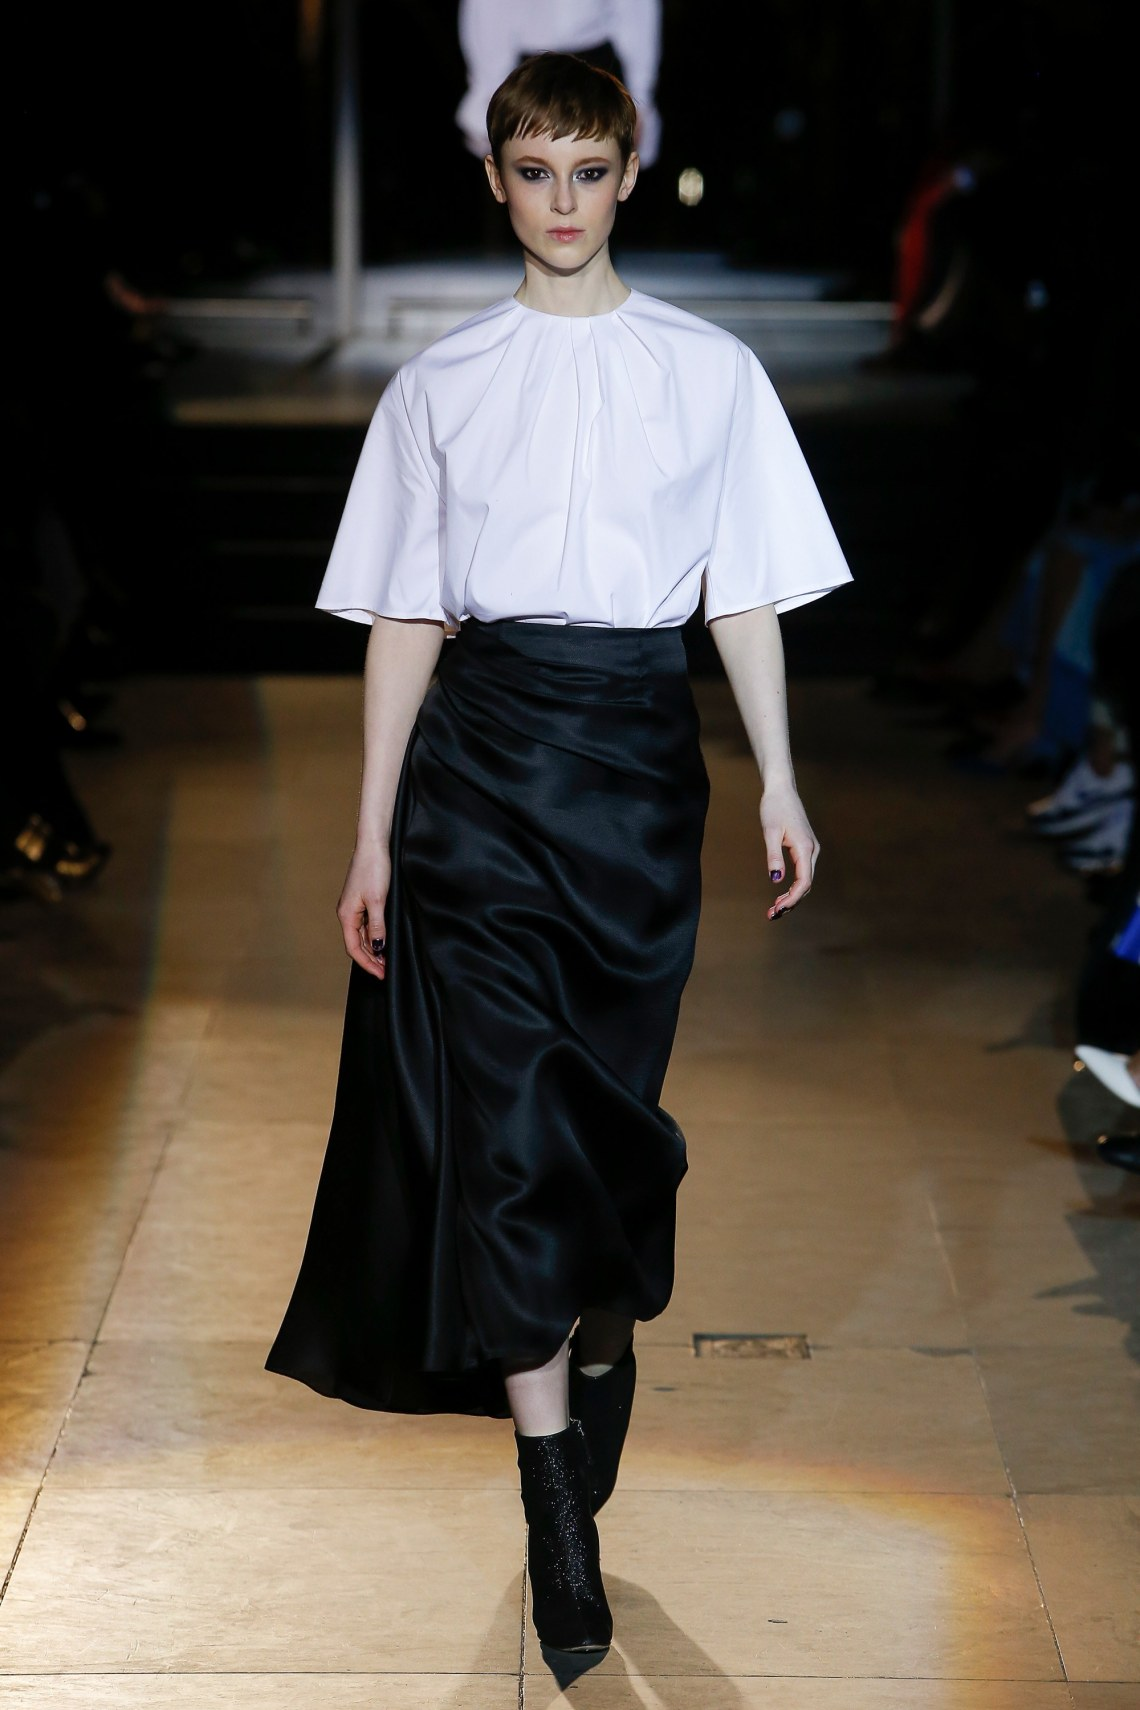 carolina herrera- fall 2018 ready to wear colelction- how to style a black skirt